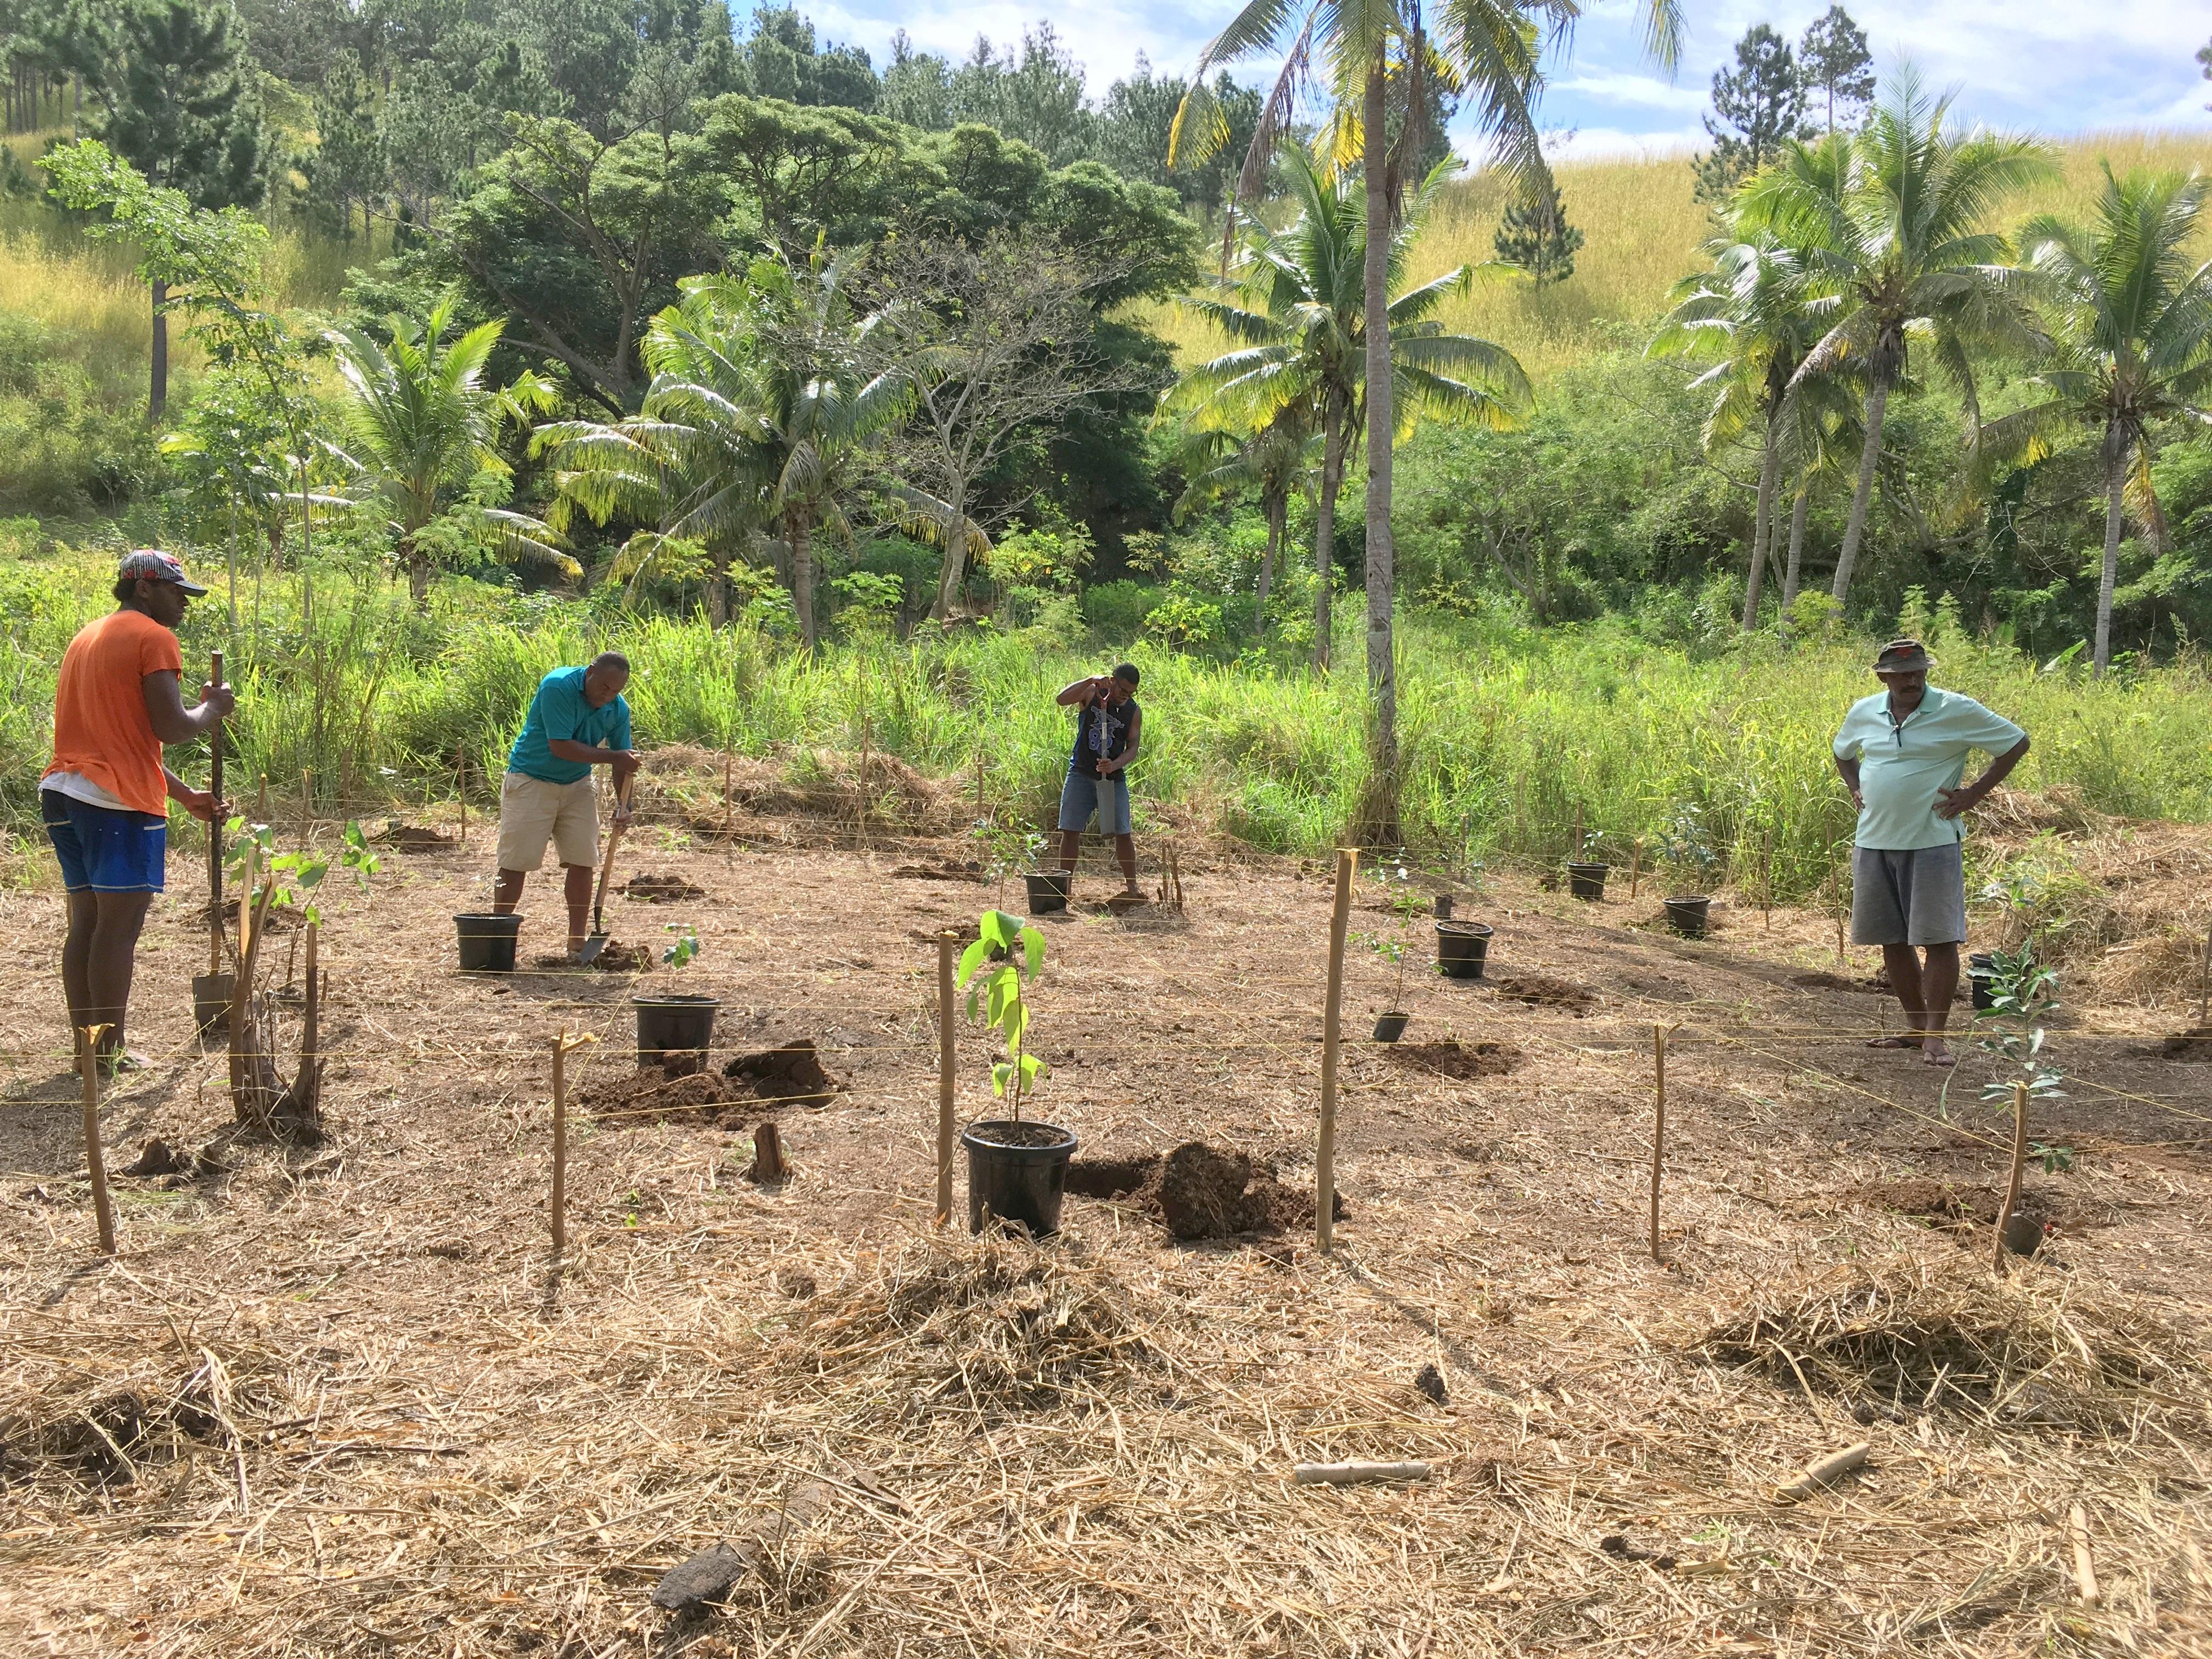 Fiji's Crested Iguana Perfect Habitat Prototype Established in Solevu Village